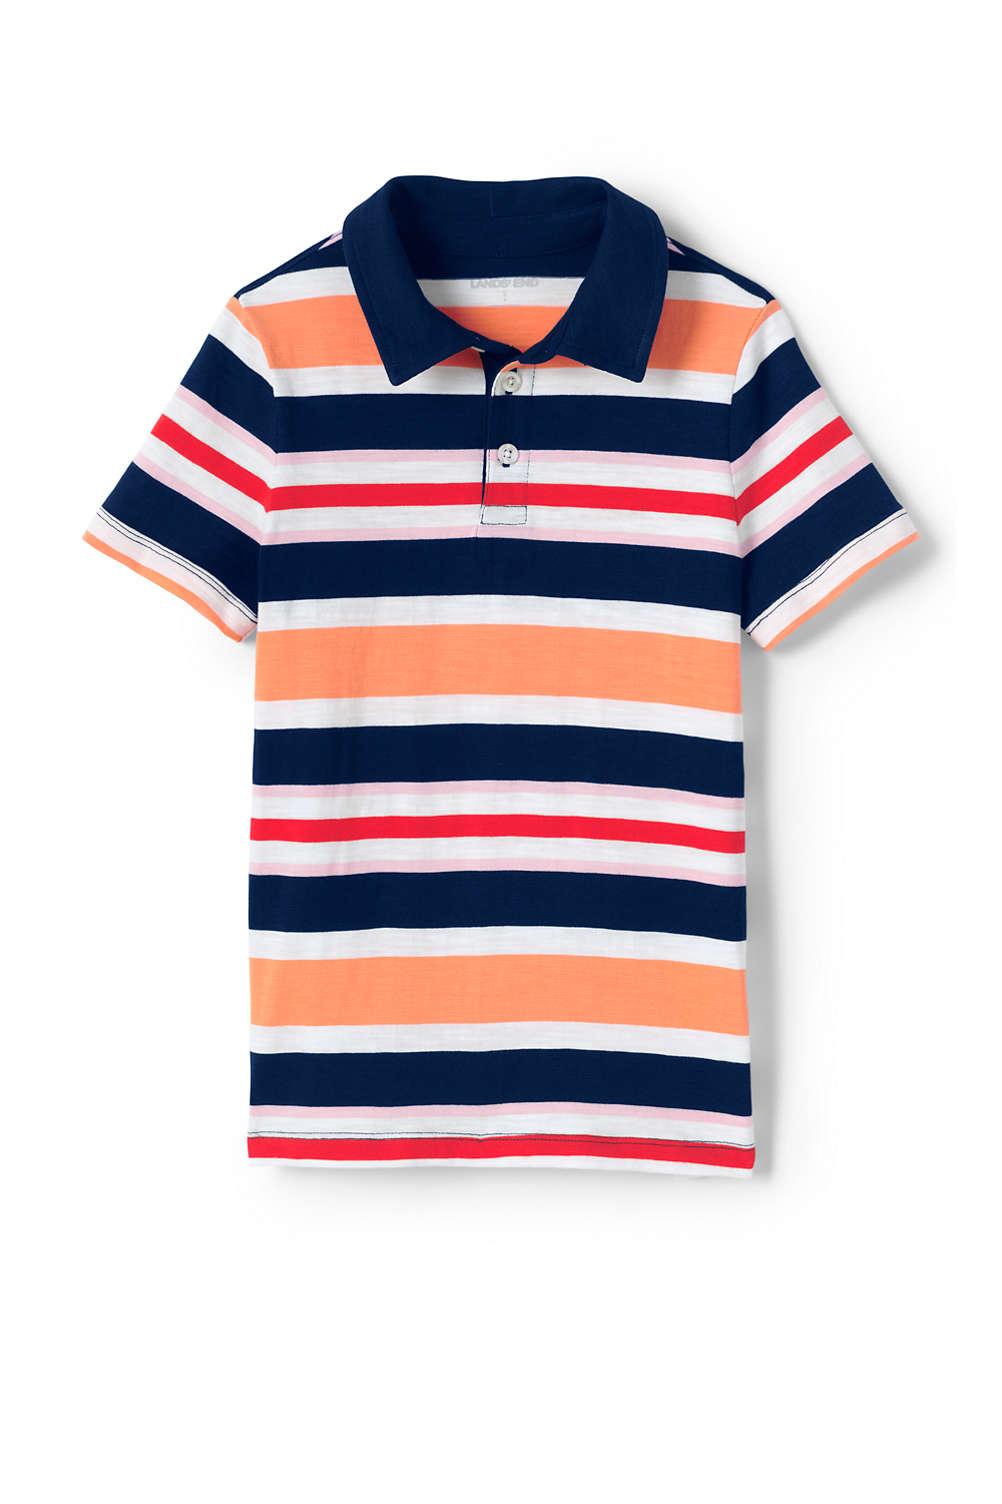 52383c3eb Toddler Boys Stripe Slub Polo Shirt from Lands' End